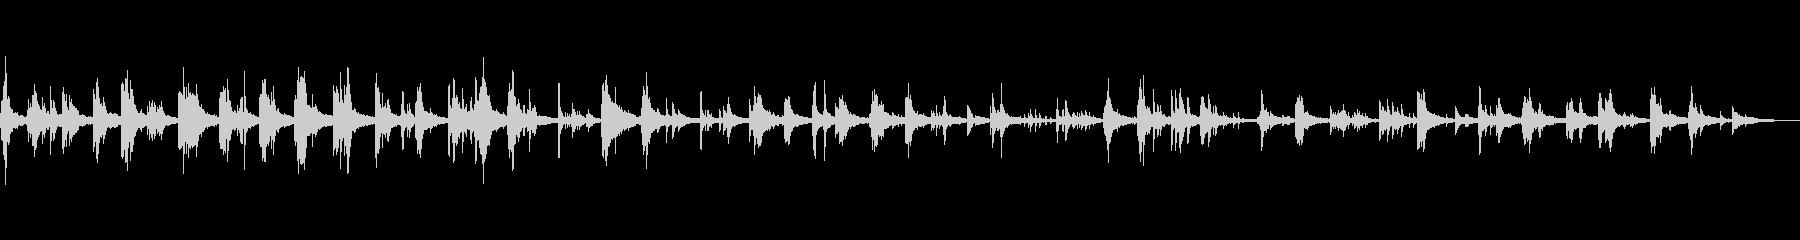 A gentle, soft and fantastic BGM's unreproduced waveform